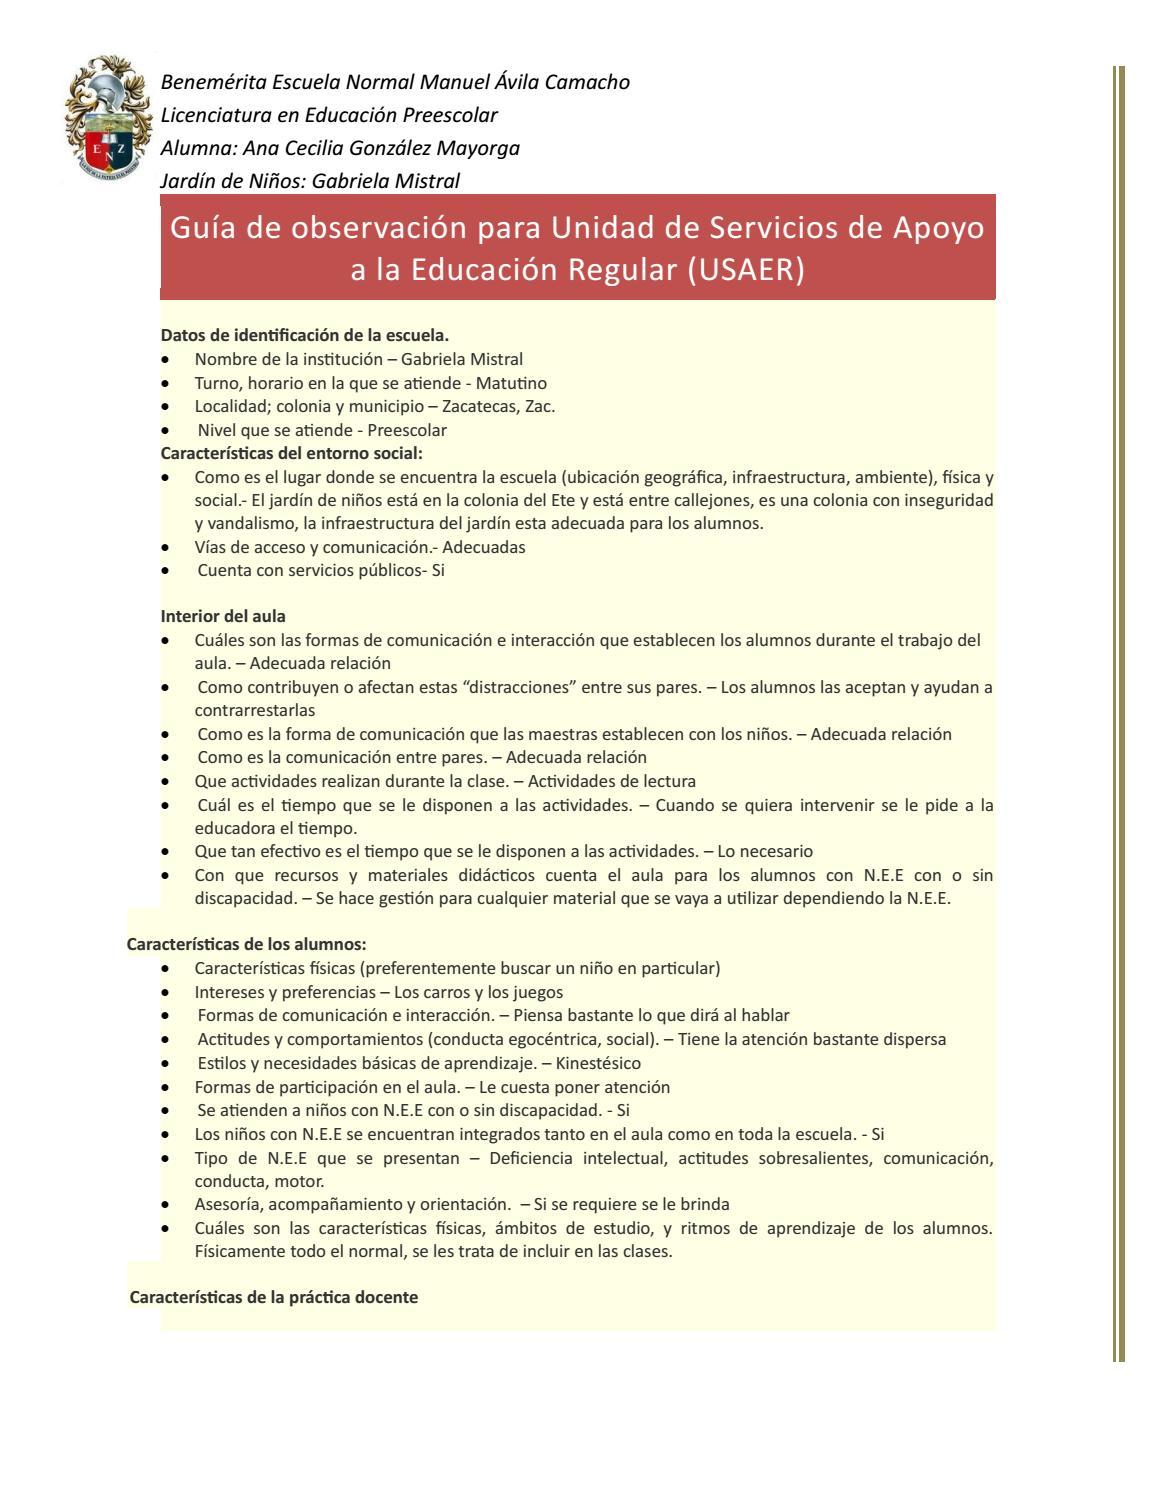 Guia de observacion del jardin by ana cecilia gonzalez mayorga - issuu